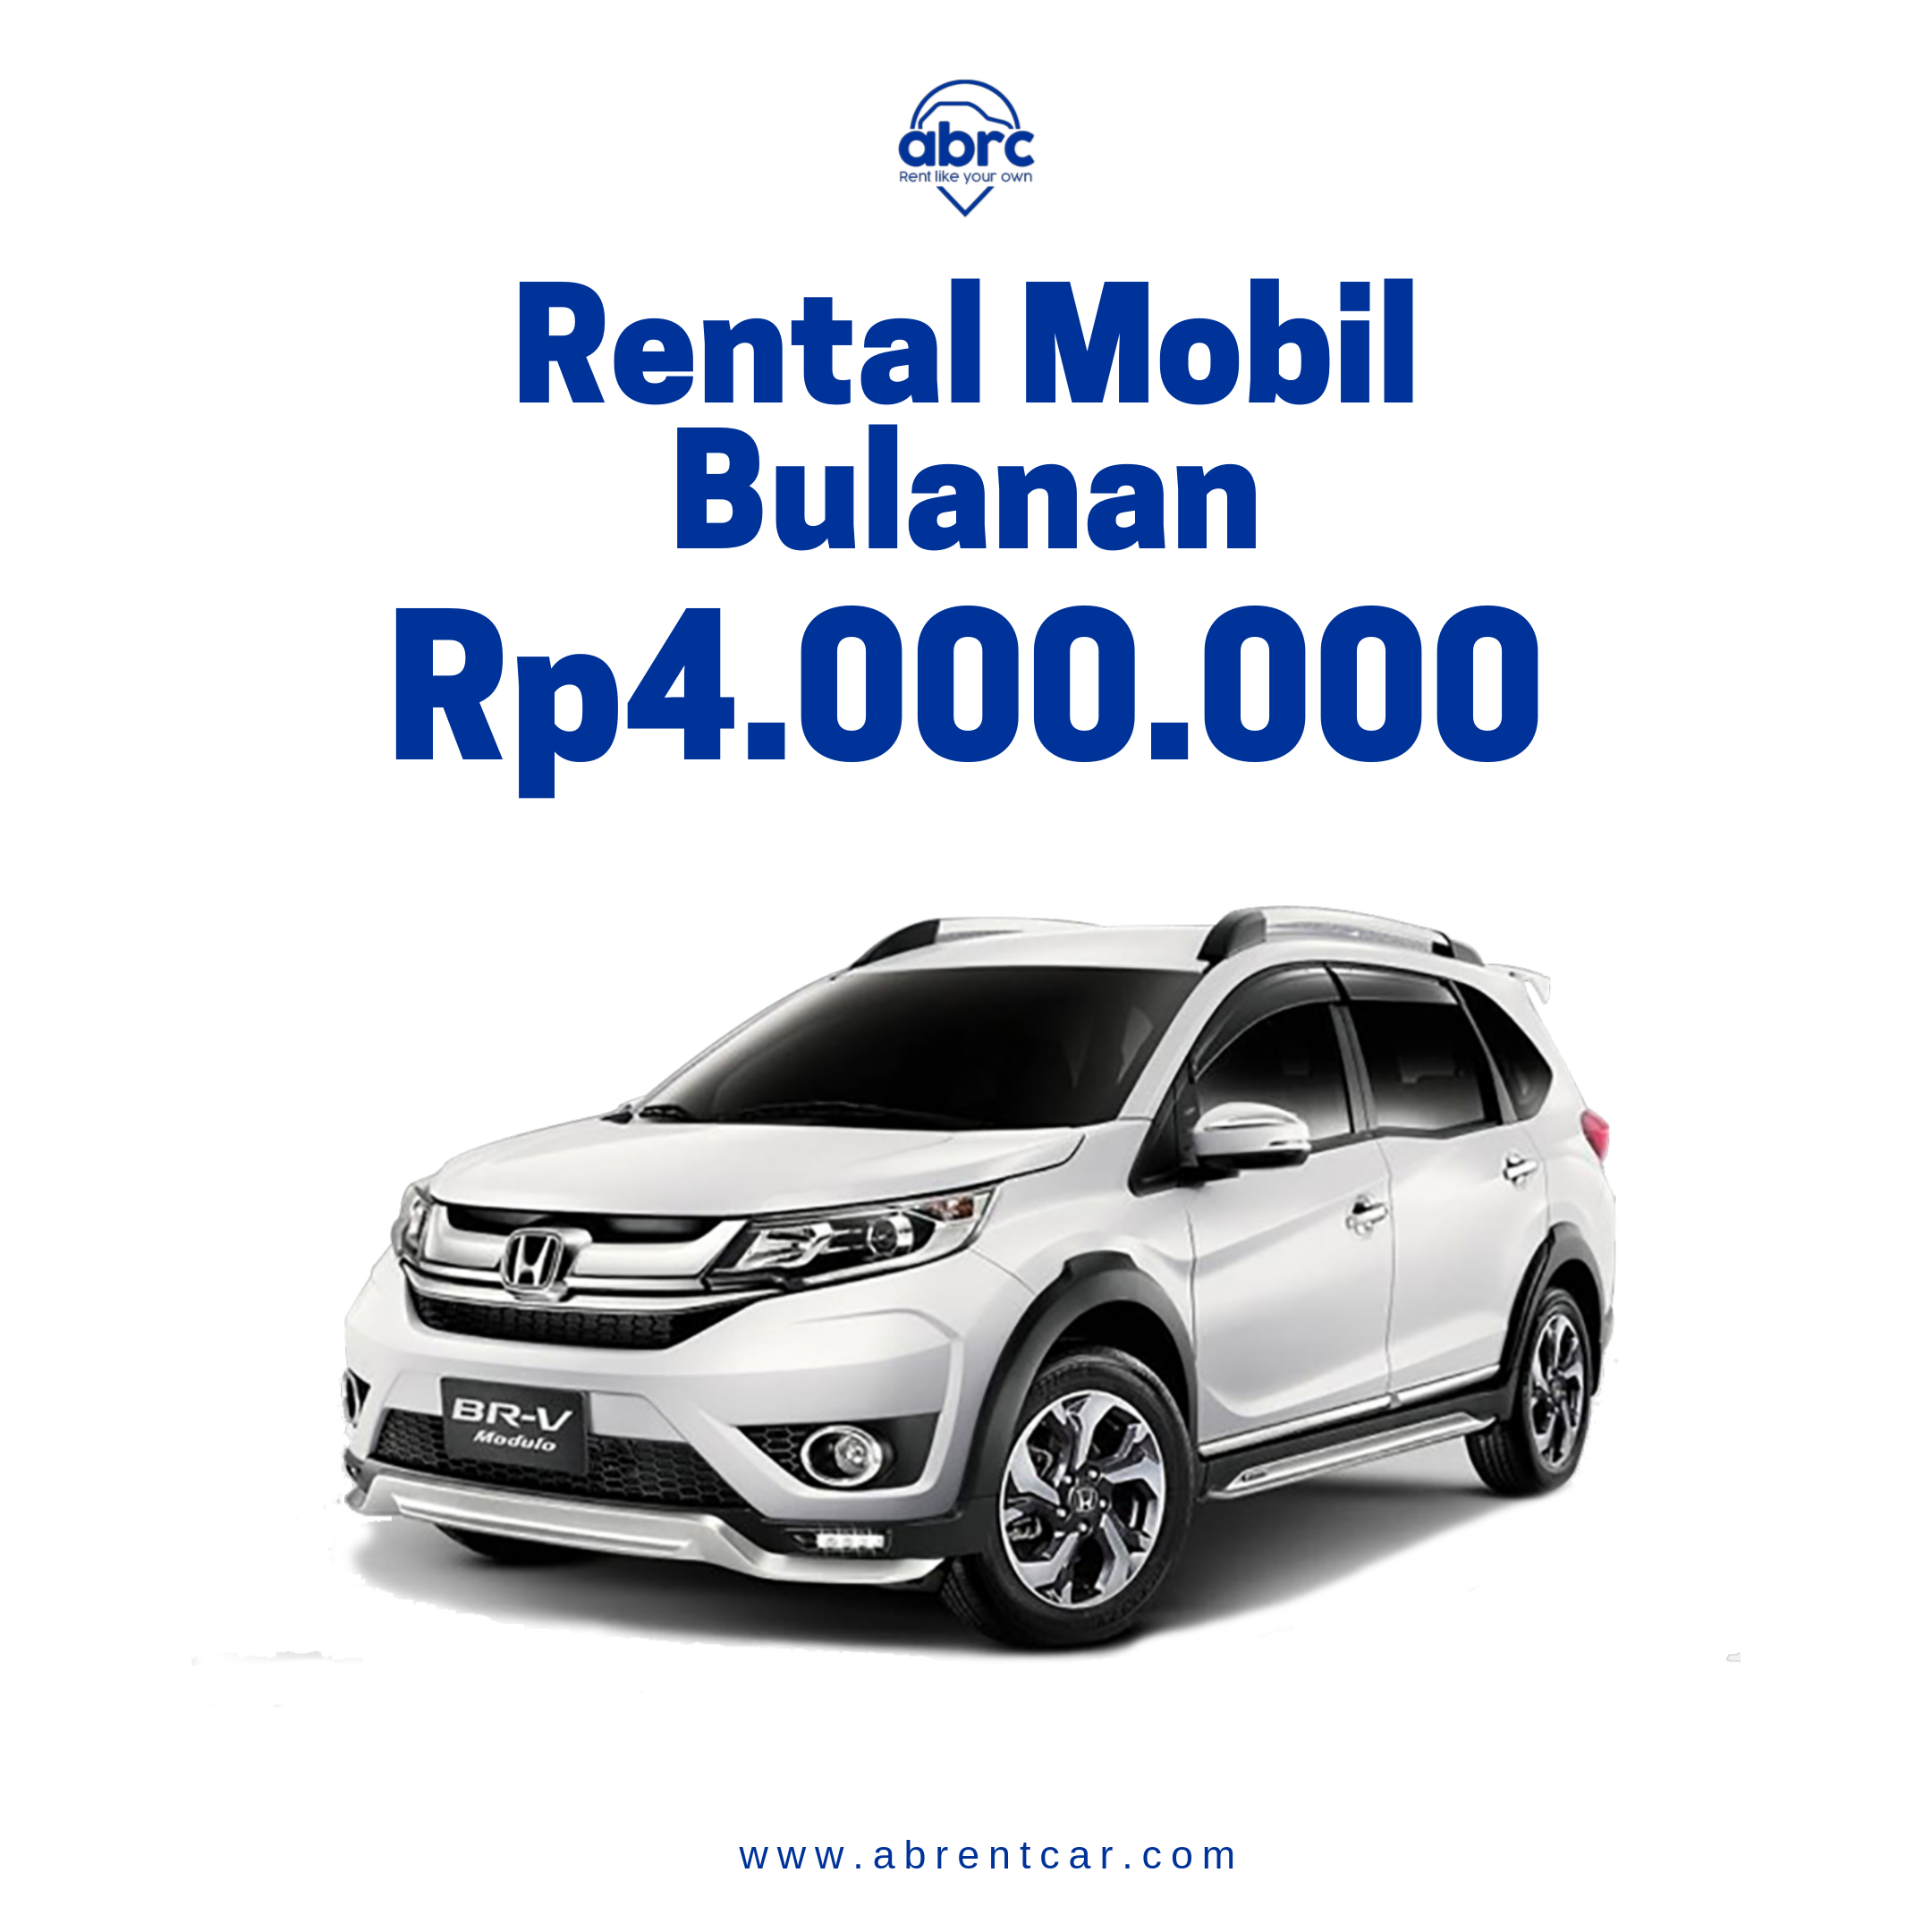 Sewa Mobil Bulanan Bandung